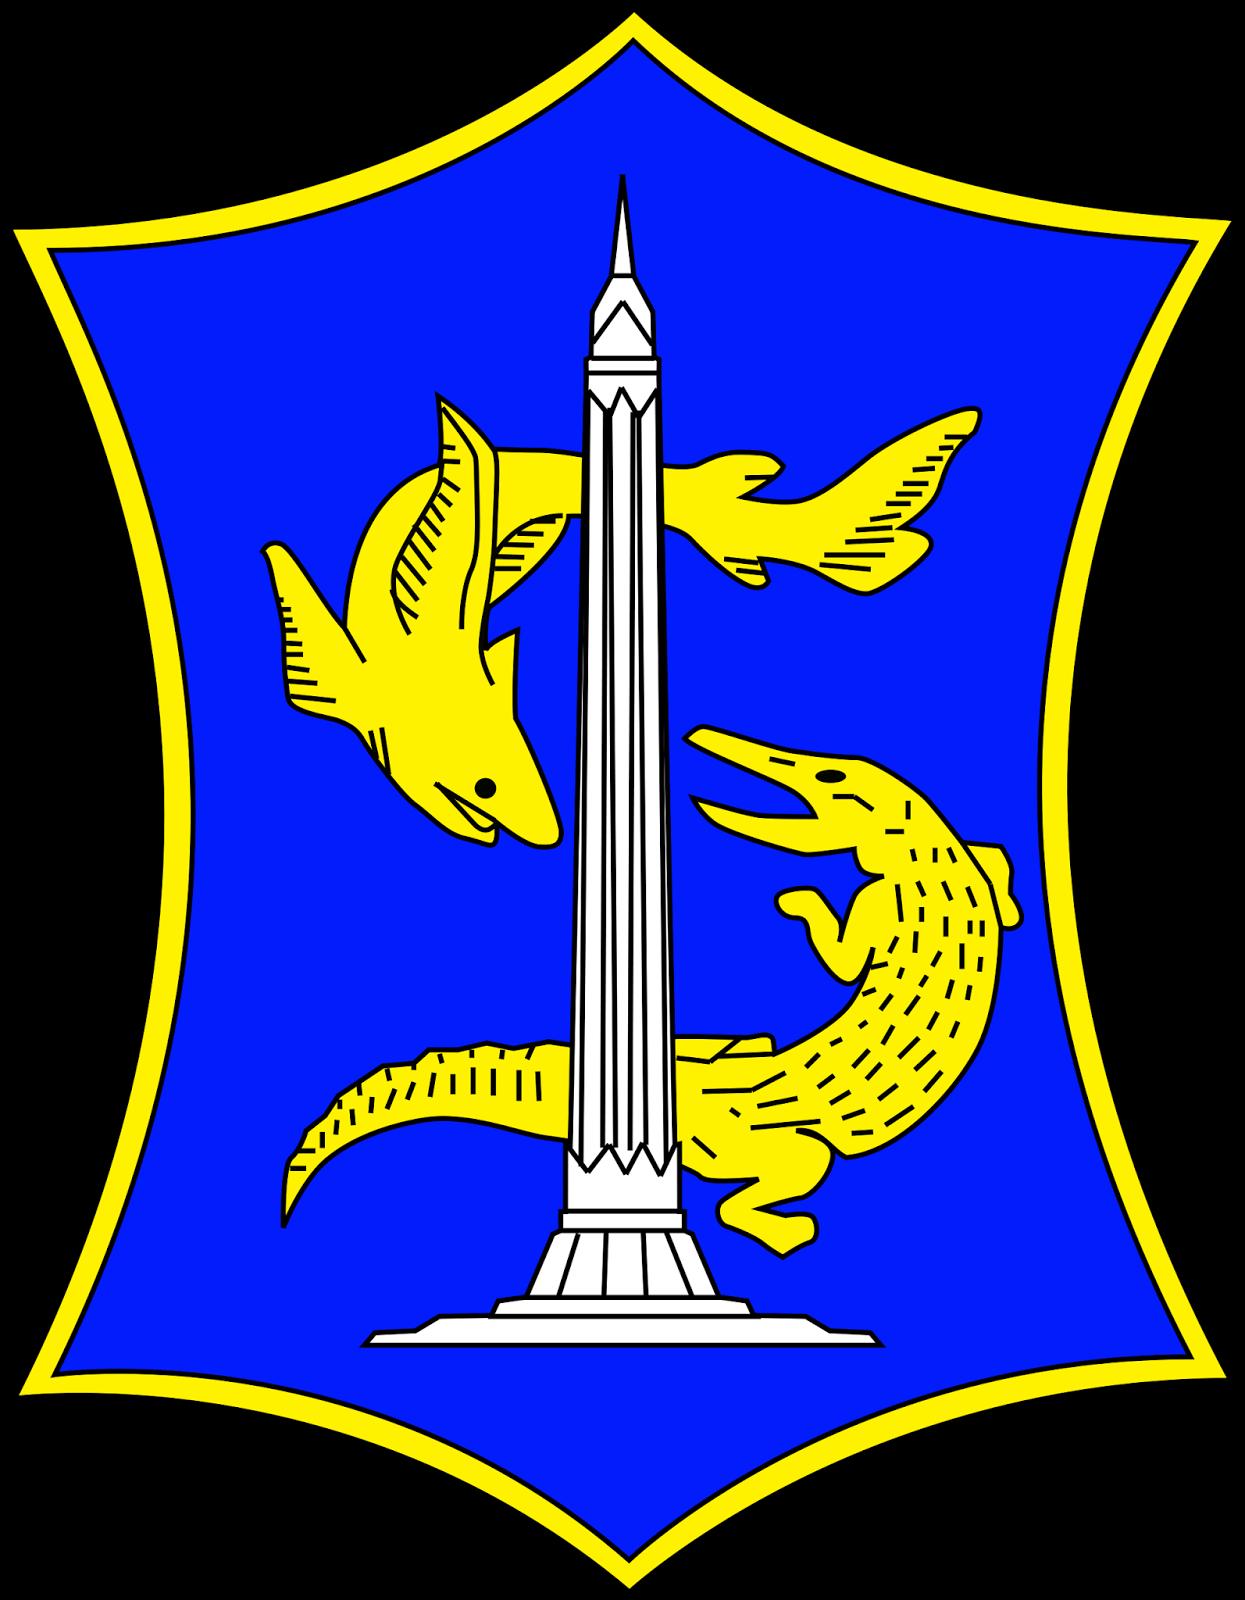 Daftar Alamat Sekolah Kota Surabaya